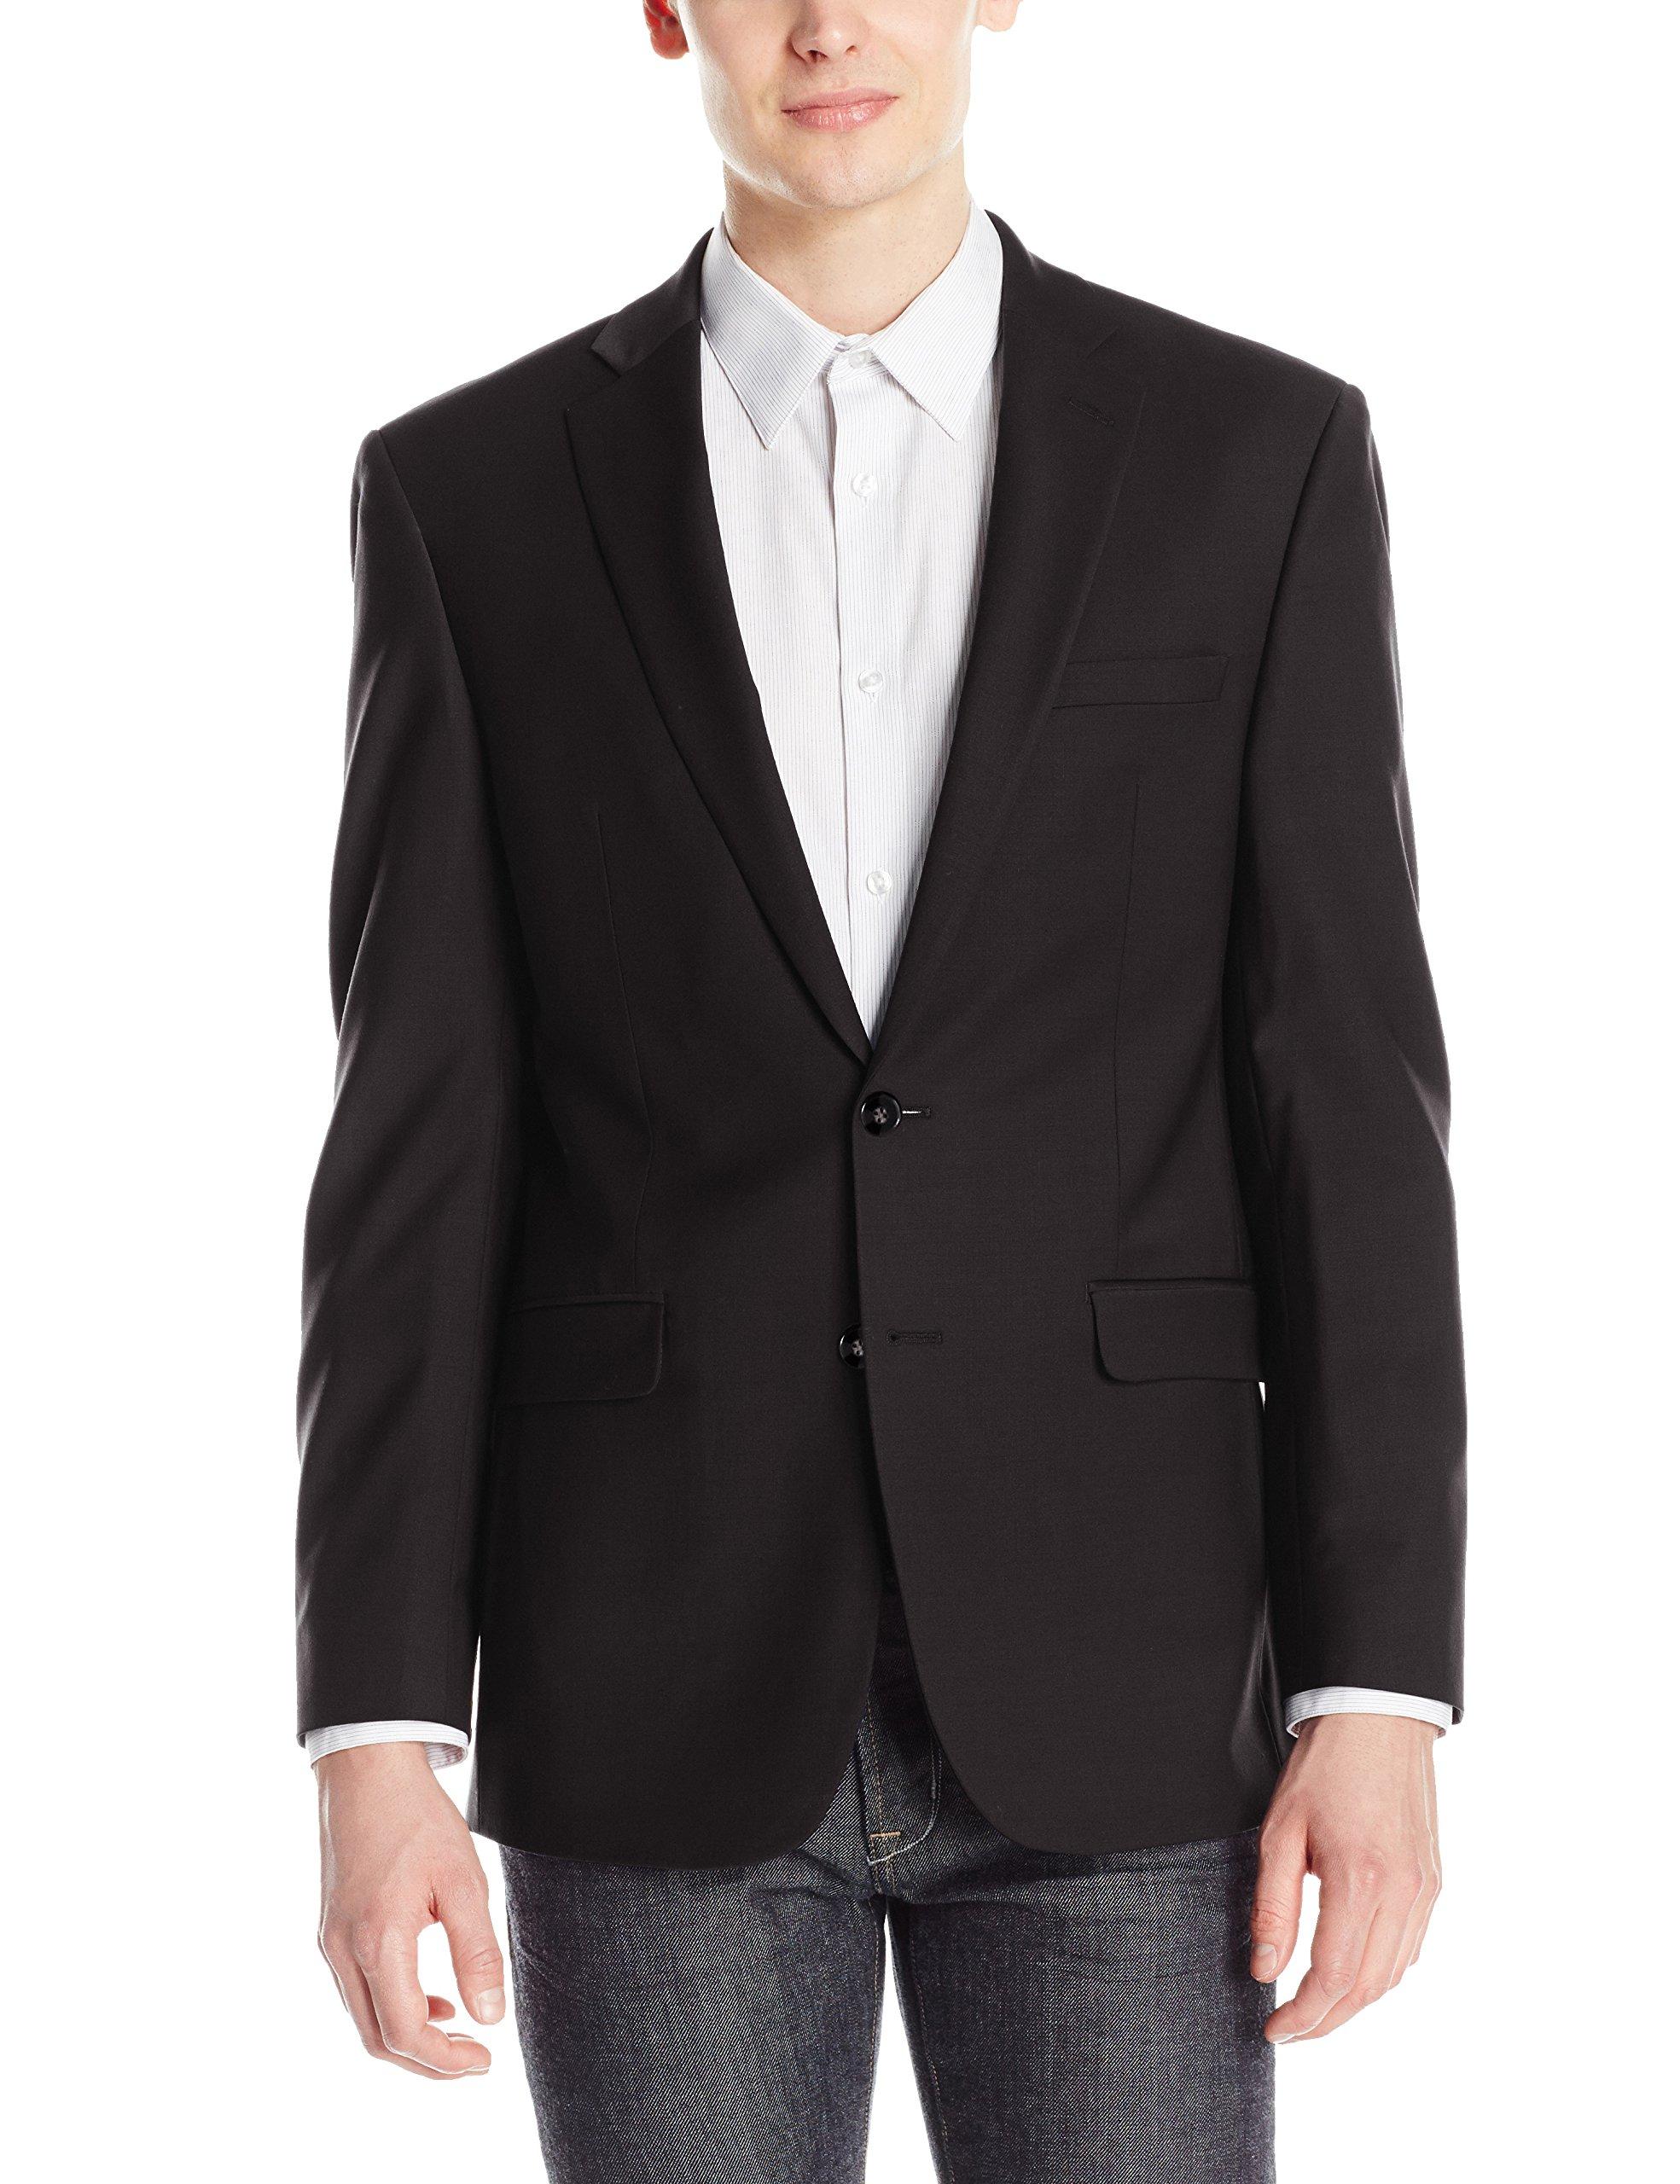 Calvin Klein Men's X-Fit Slim Stretch Suit Separate (Blazer and Pant), Black, 48 Regular